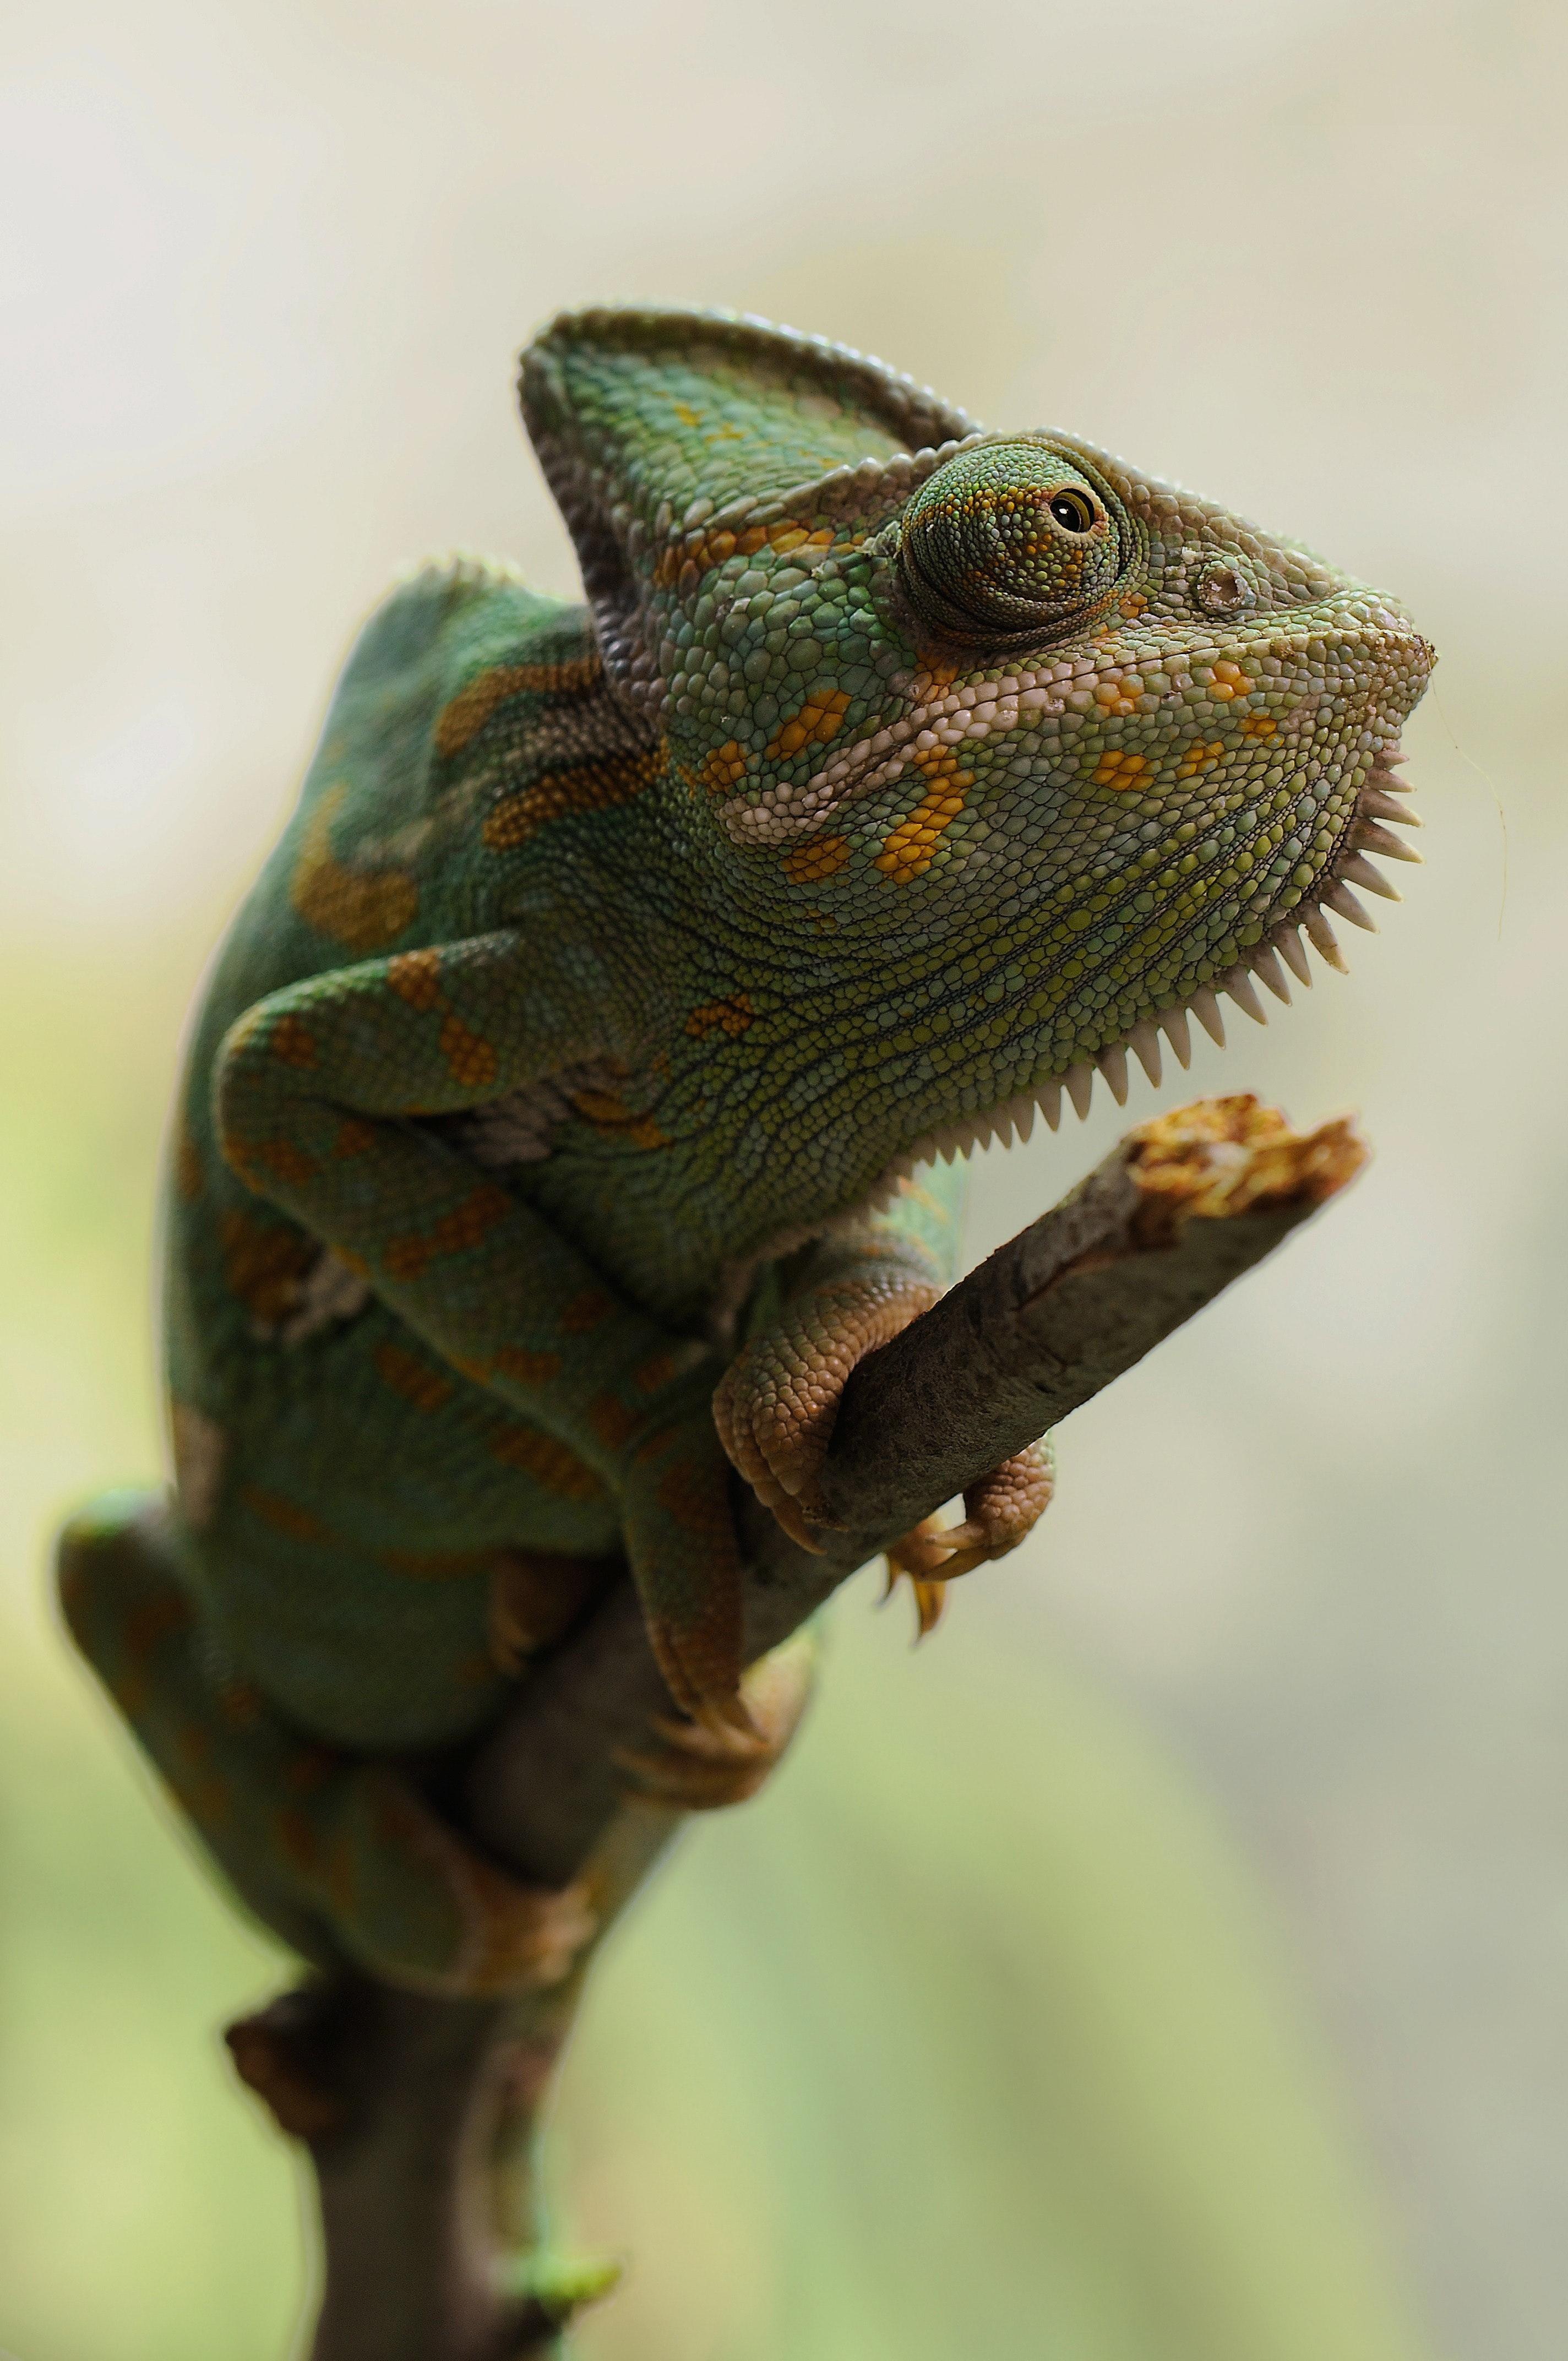 Yellow and green coated lizard photo